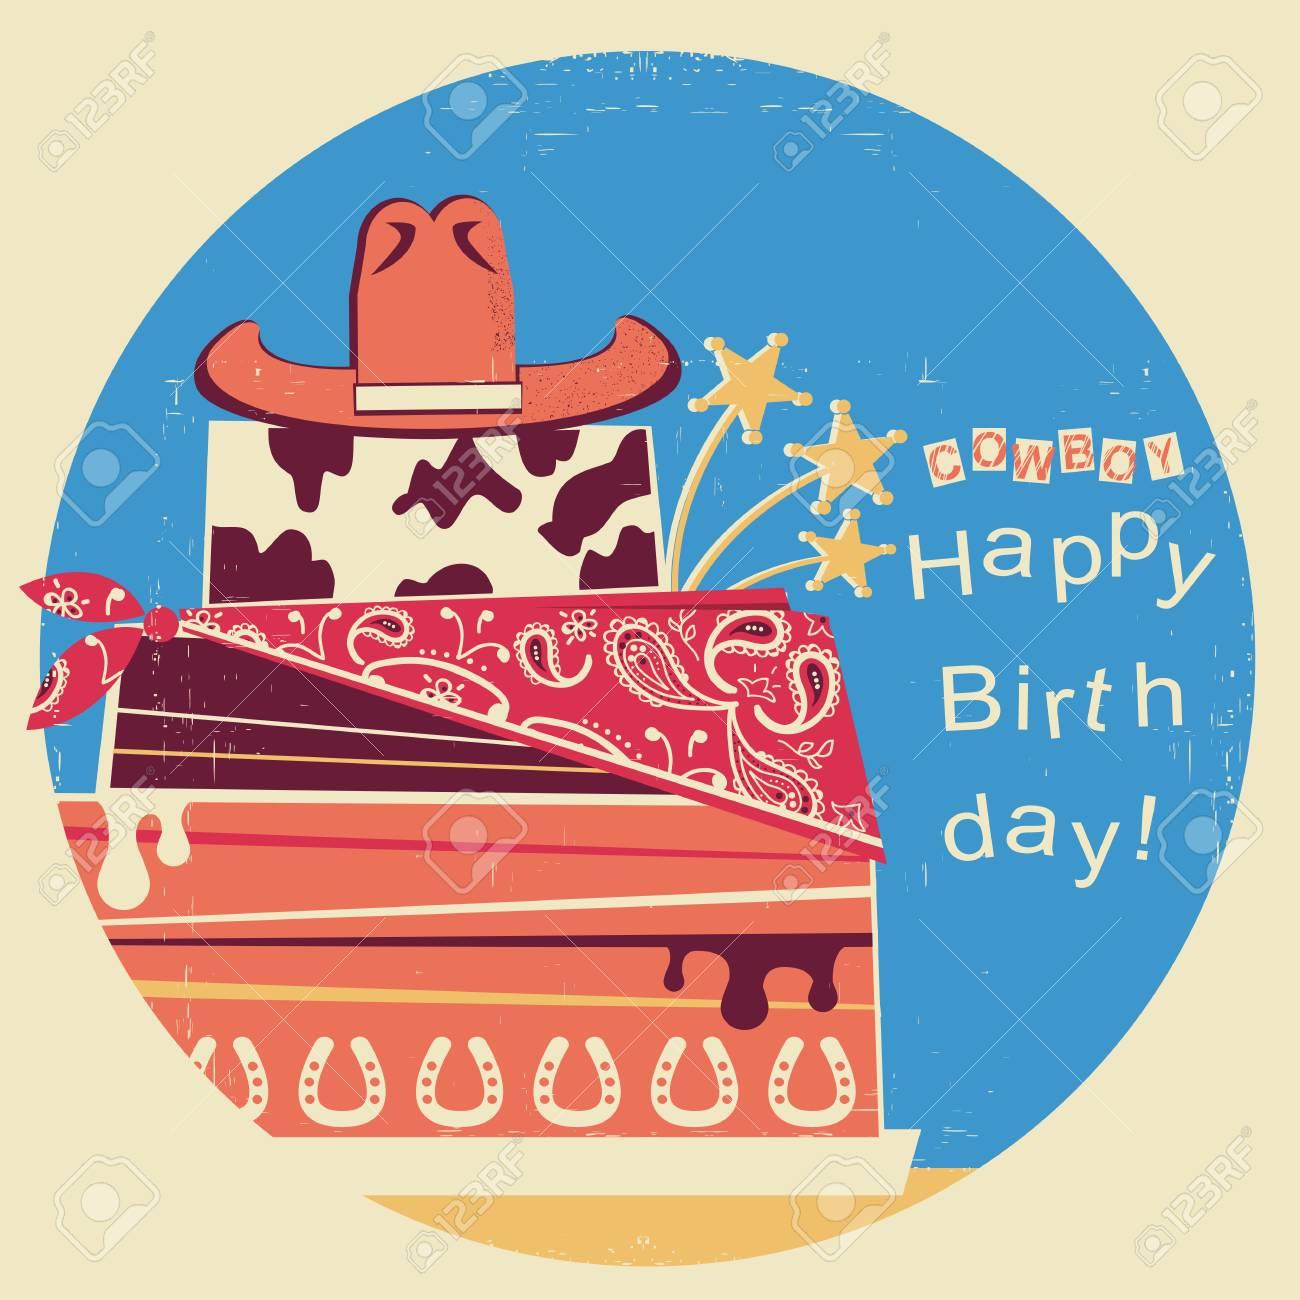 Happy Birthday Cowboy Images